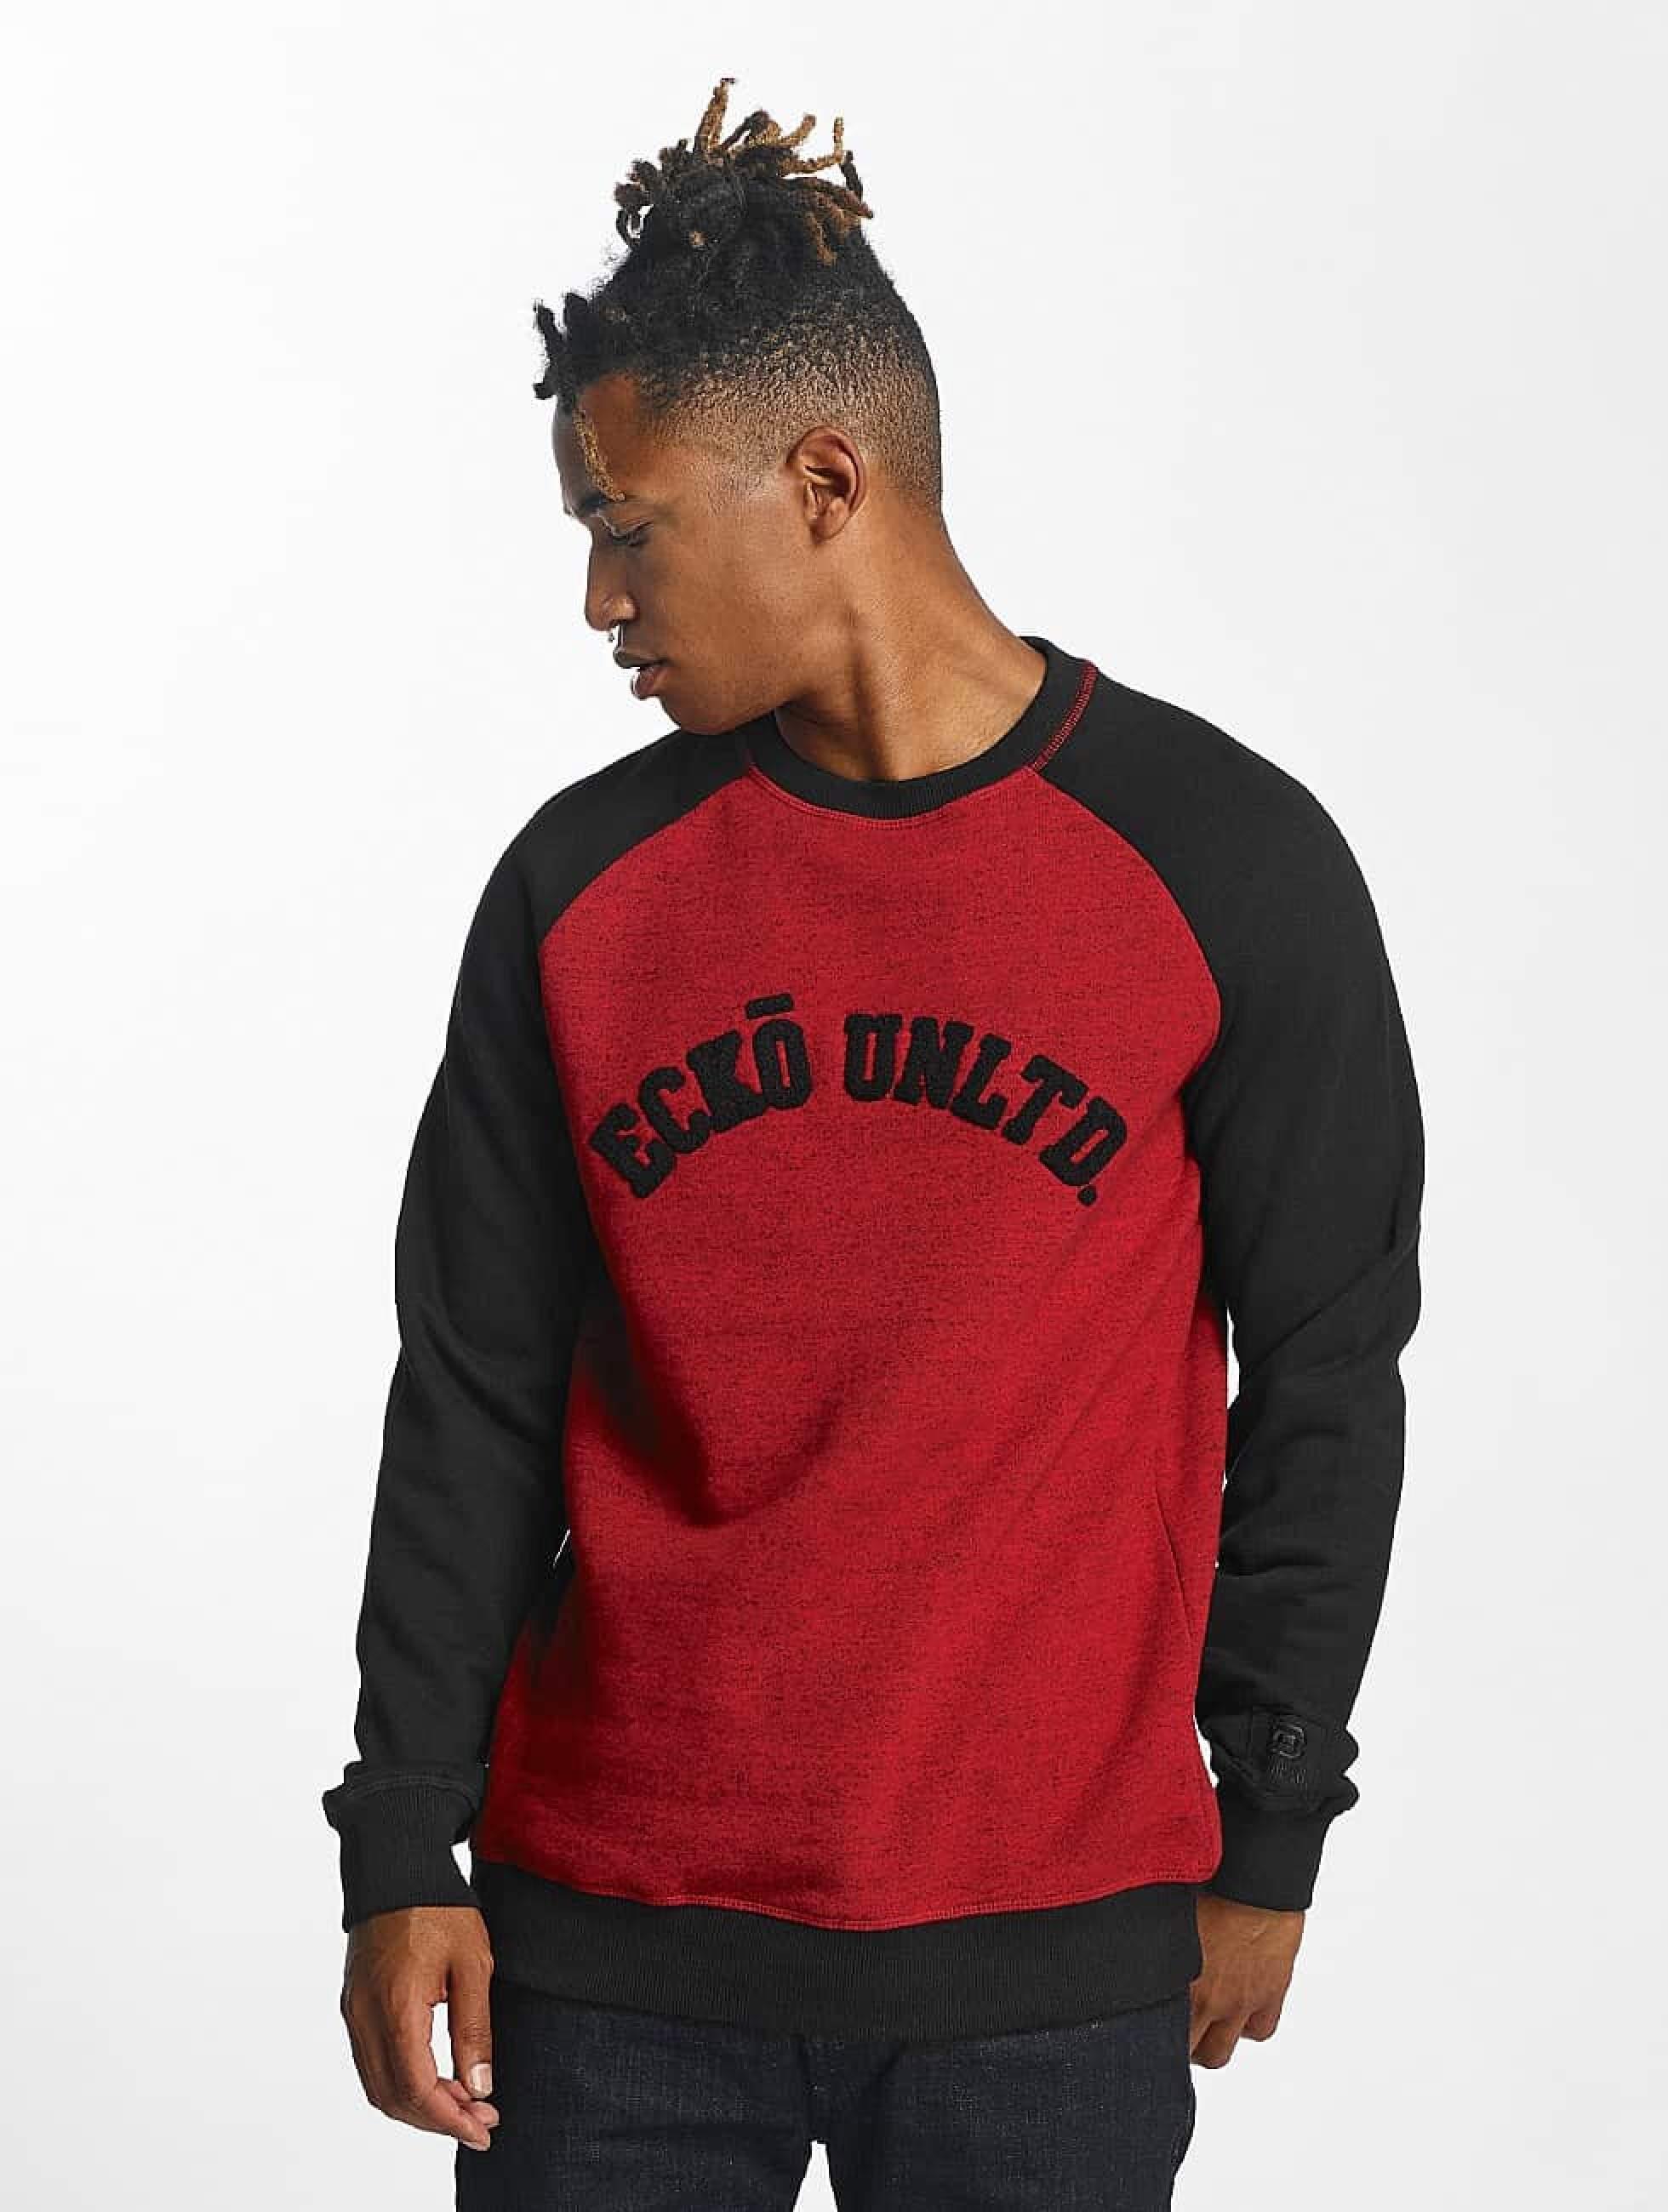 Ecko Unltd. / Jumper Dagoba in red 6XL